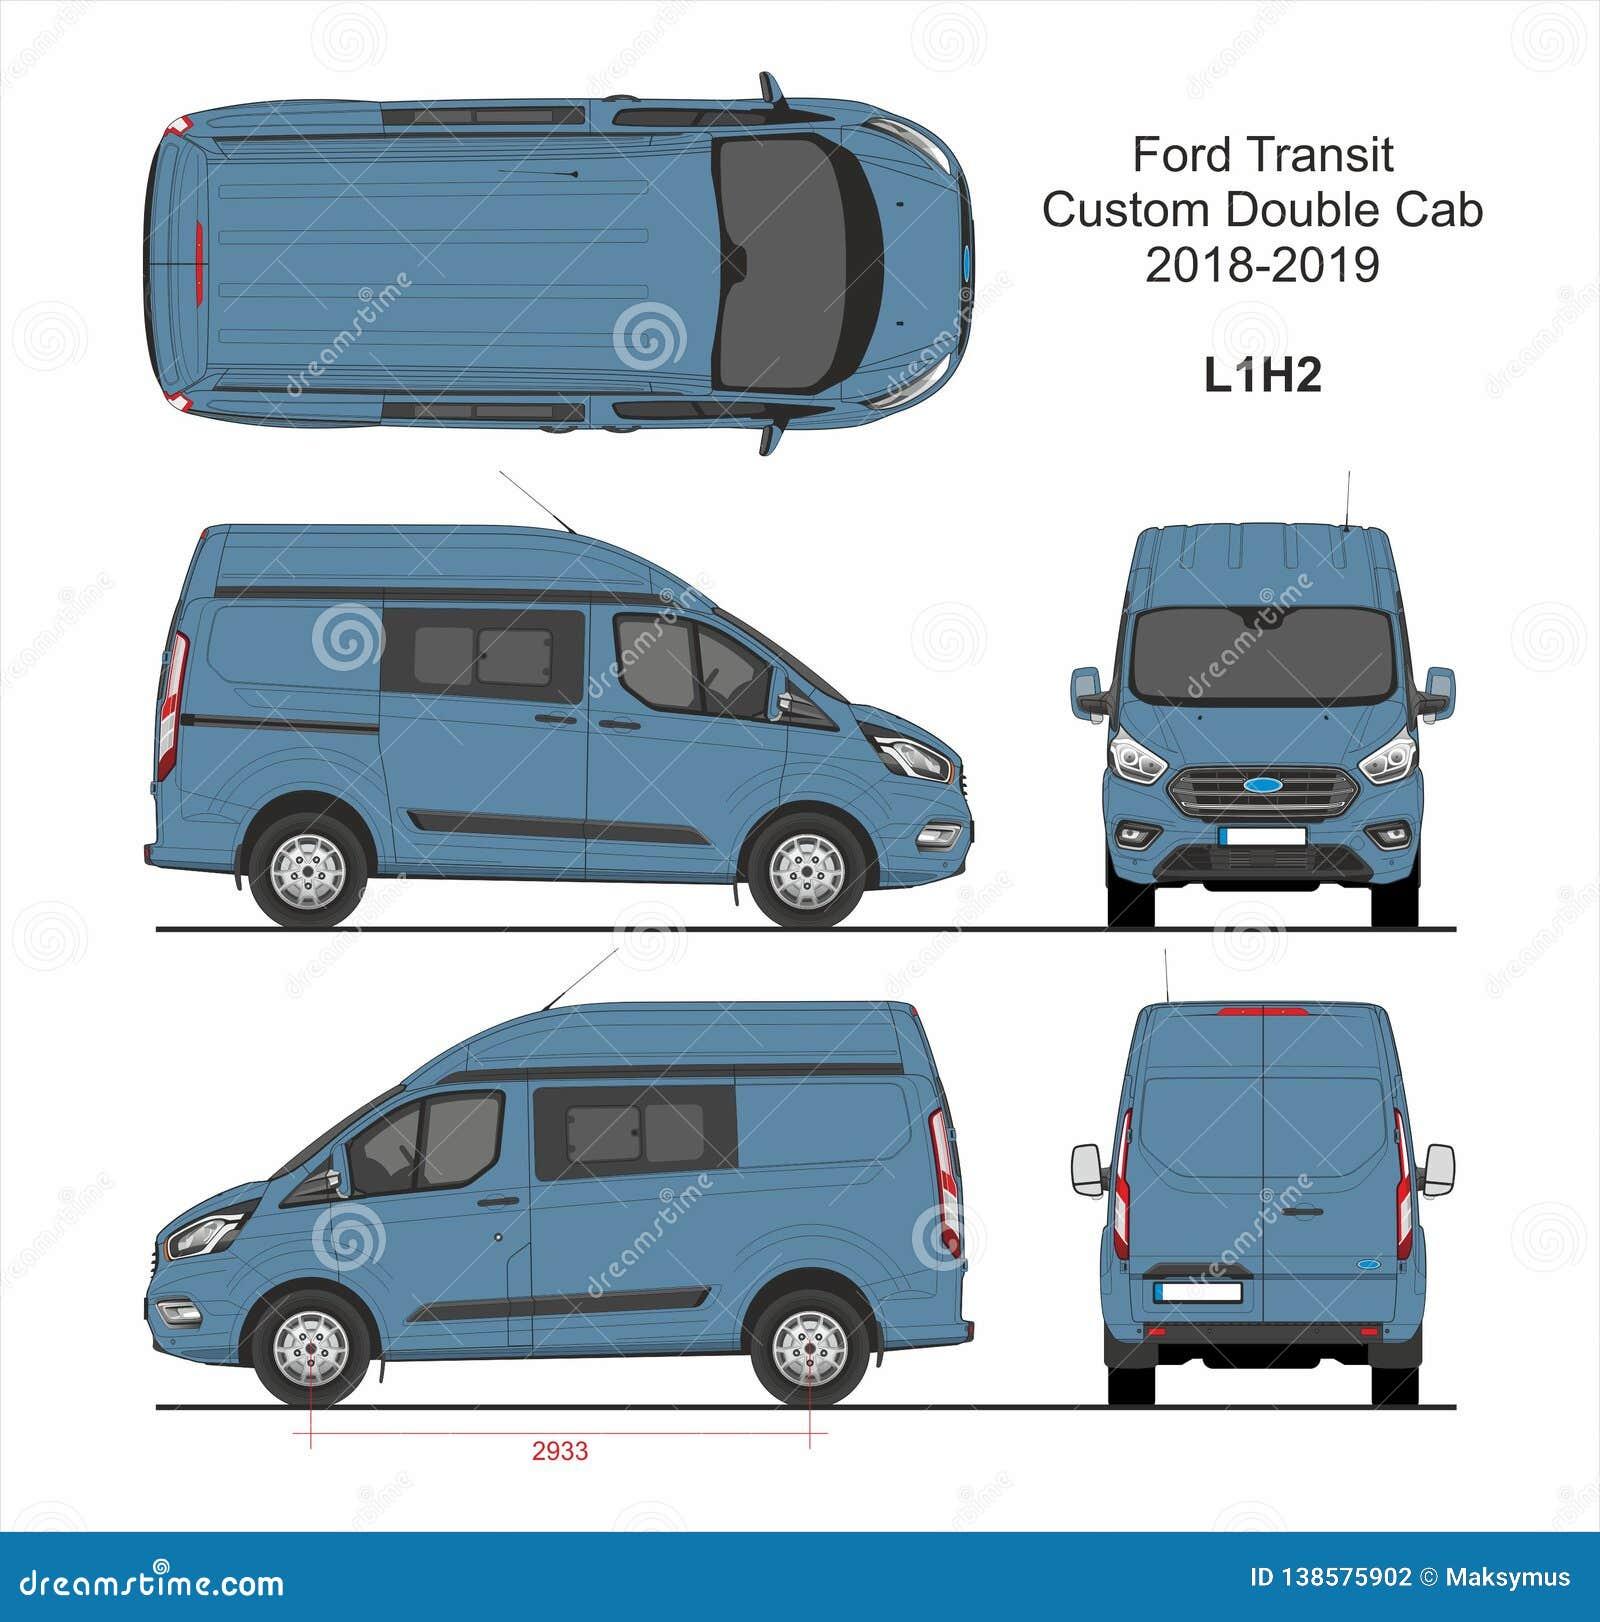 Ford Transit Custom Delivery Van L1h2 2018 2019 Redaktionelles Stockfotografie Illustration Von Anlieferung Furt 138575902